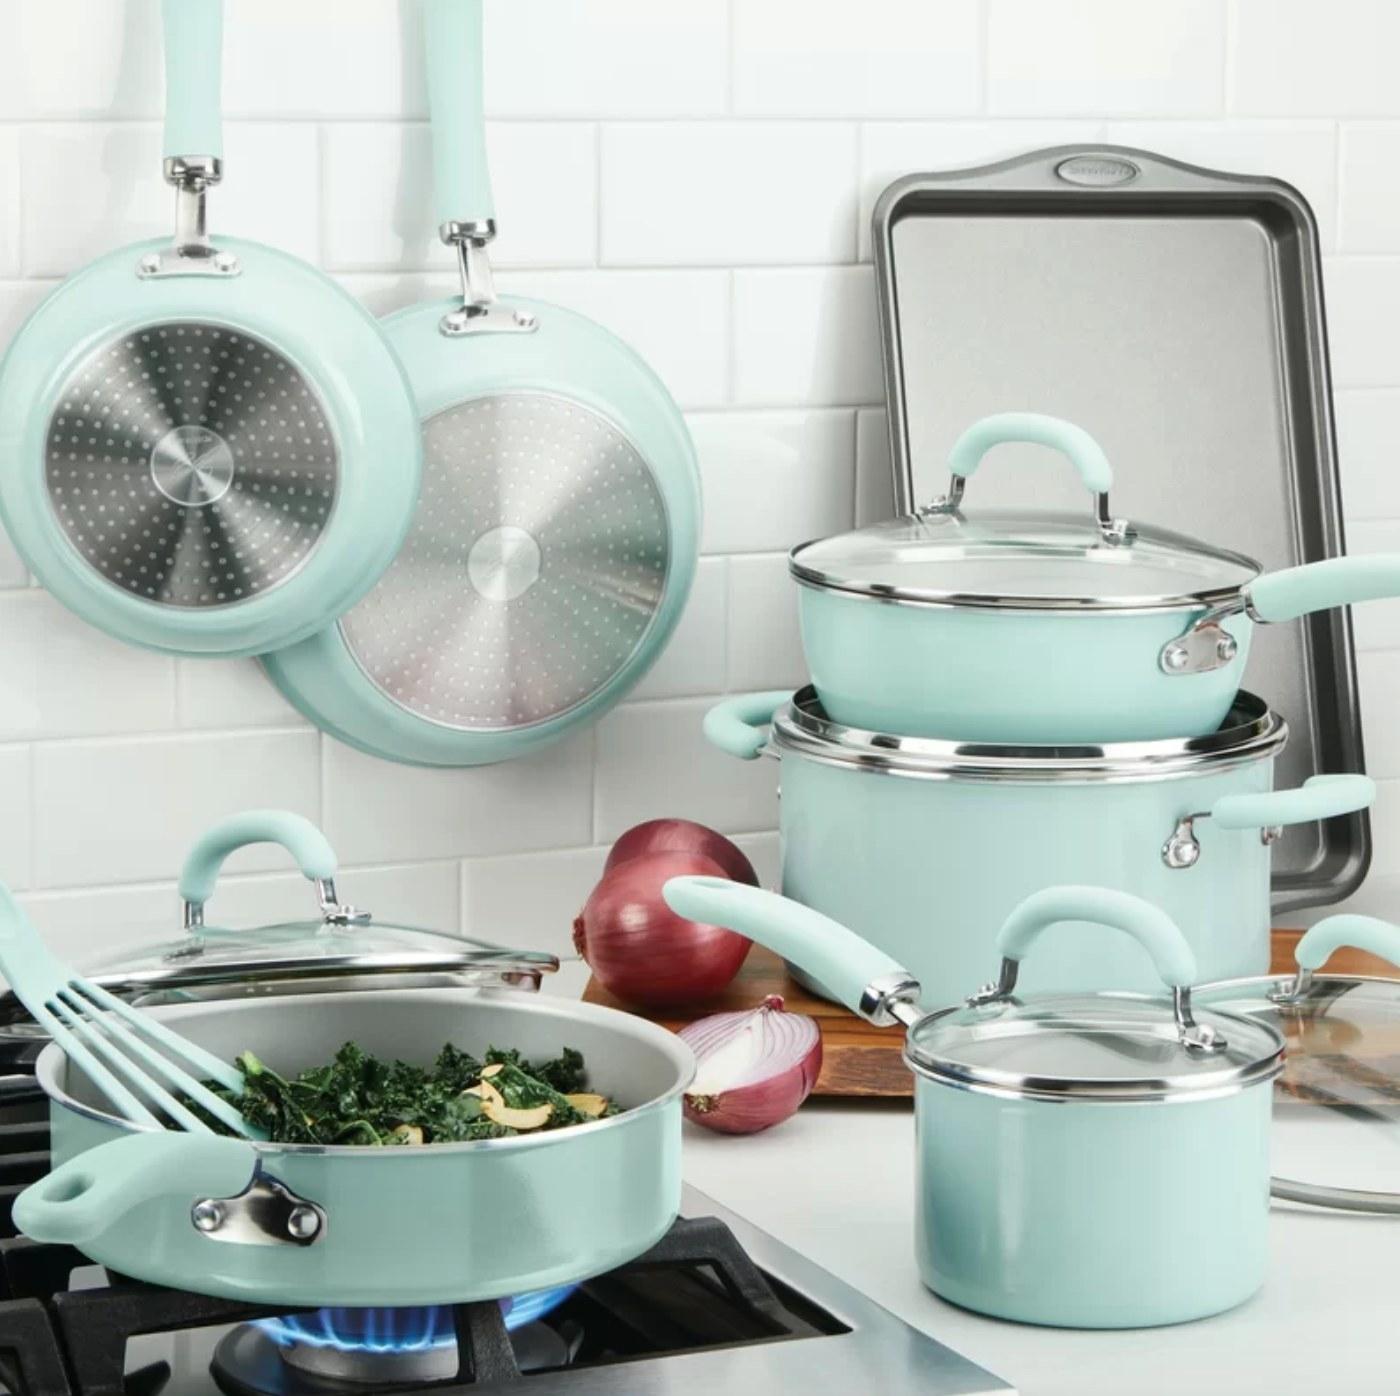 The 13 piece non-stick cookware set